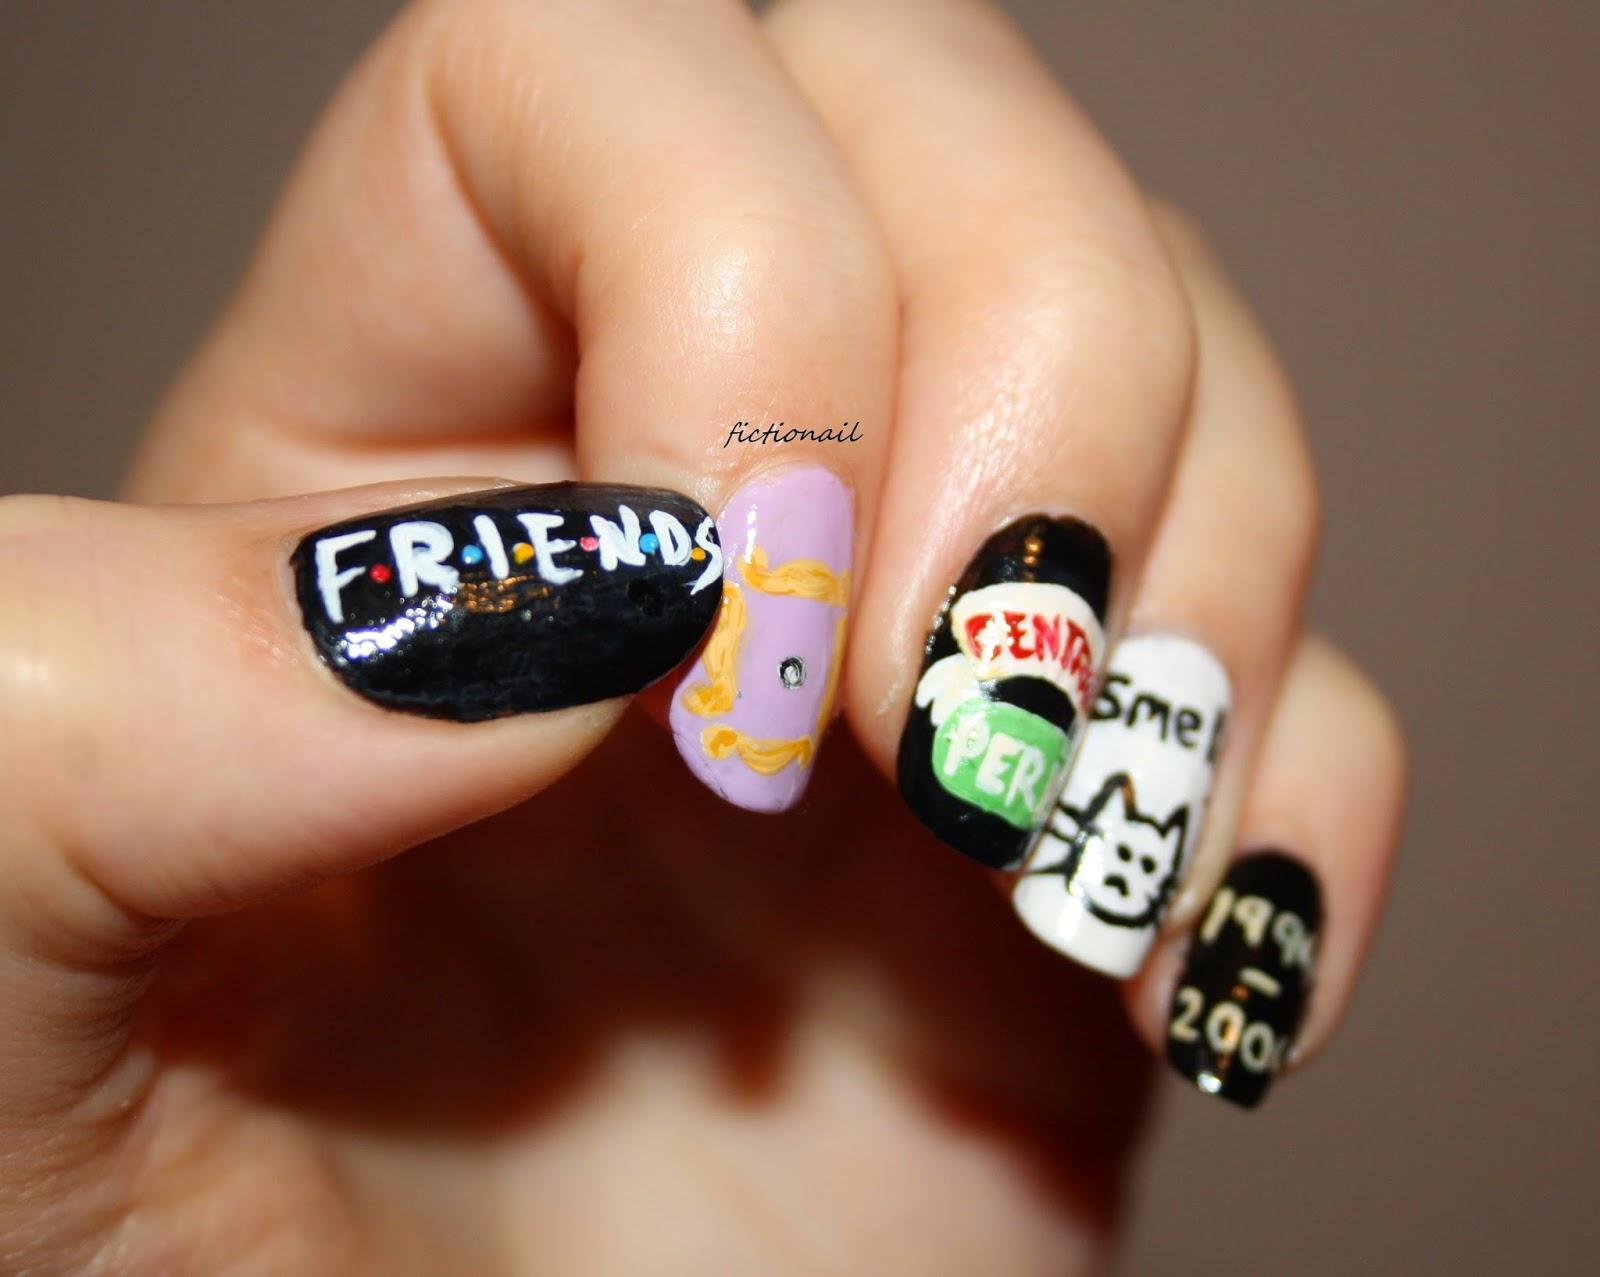 Friends Nails